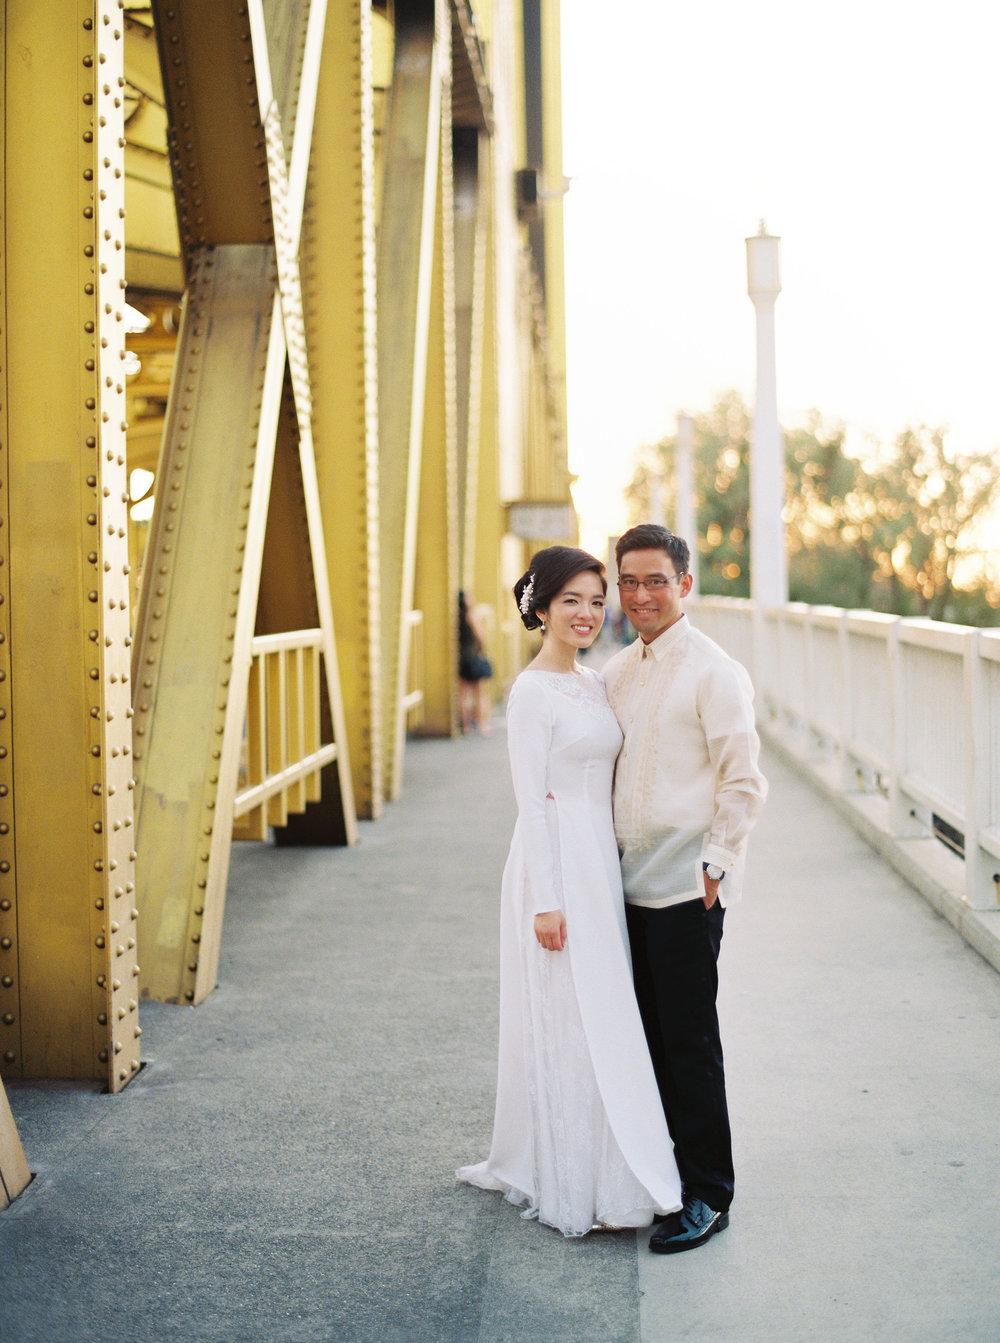 firehouse-restaurant-wedding-in-downtown-sacramento-california-136.jpg